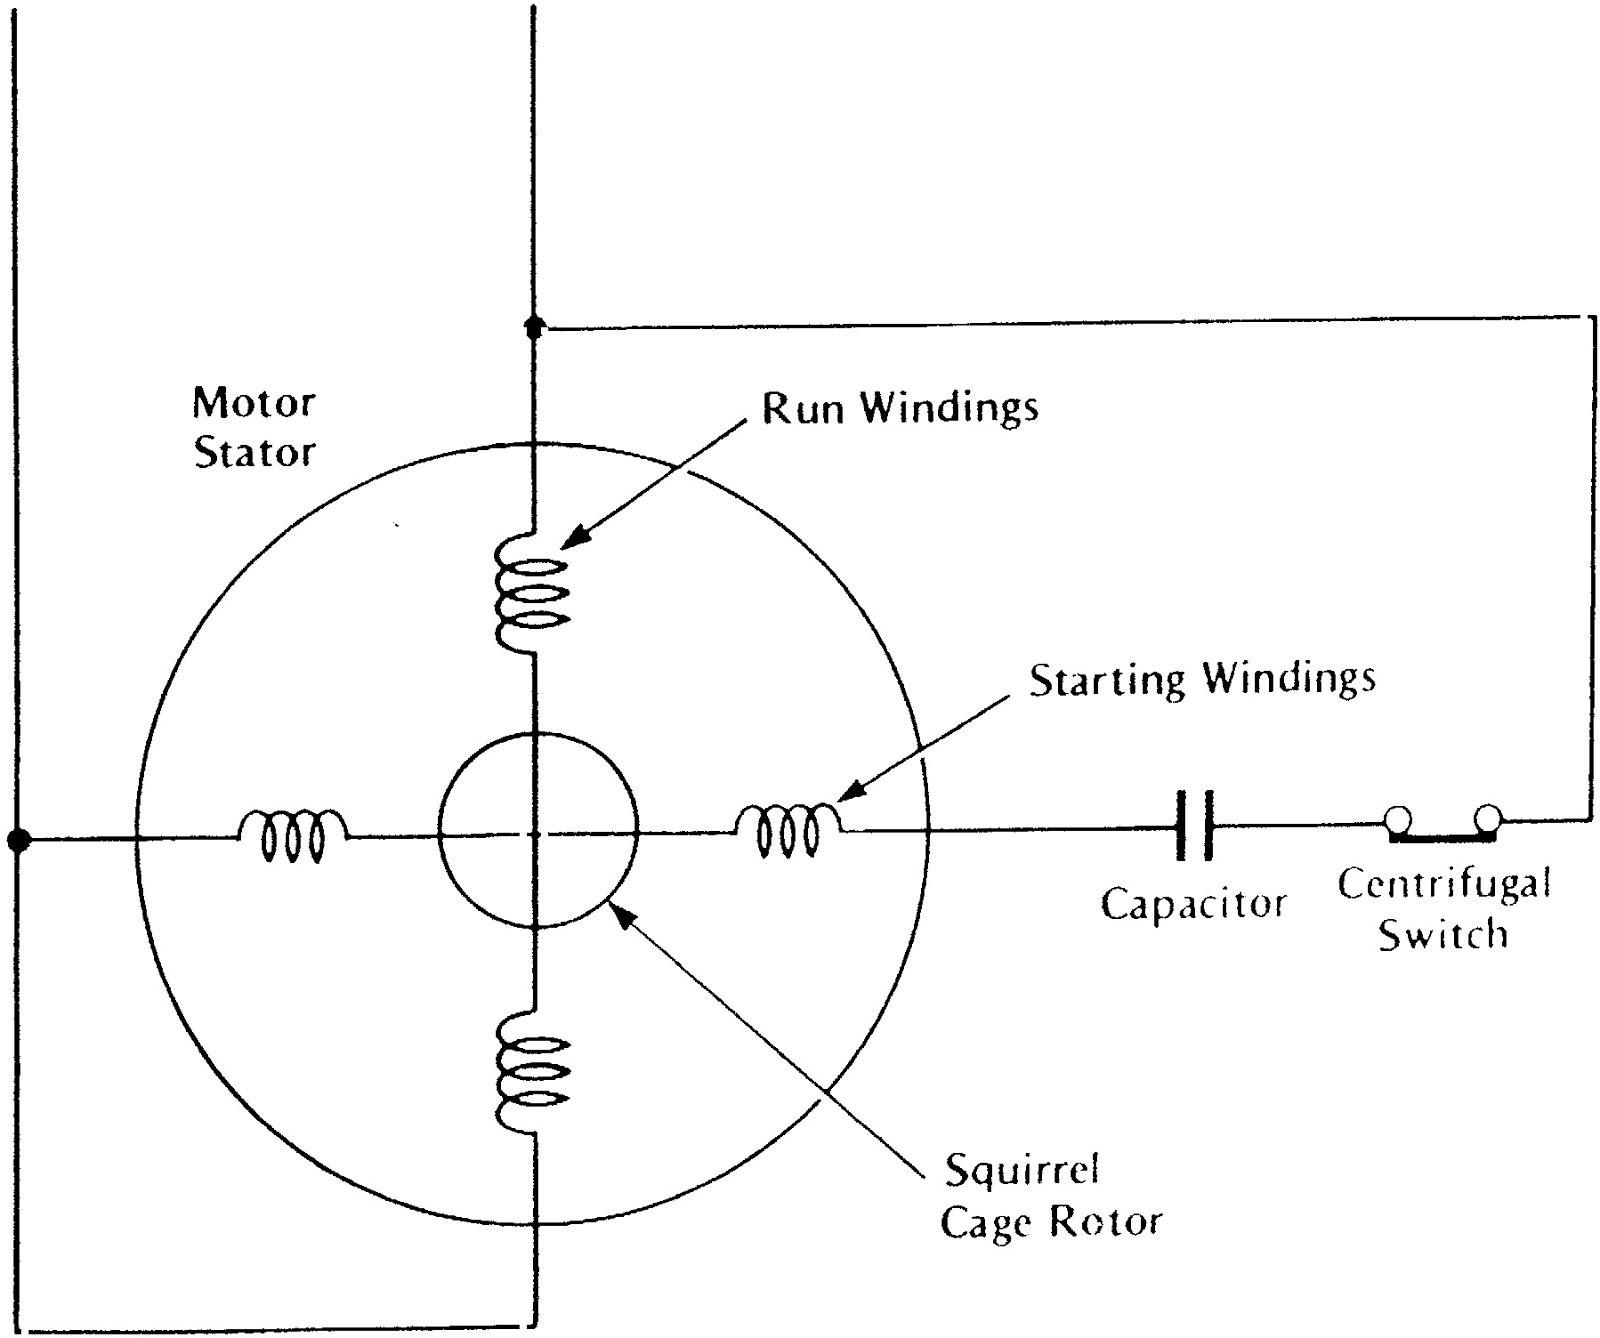 Baldor Motor Capacitor Wiring Diagram Types Single Phase Induction Motors Best Motor Wiring Diagram Of Baldor Motor Capacitor Wiring Diagram